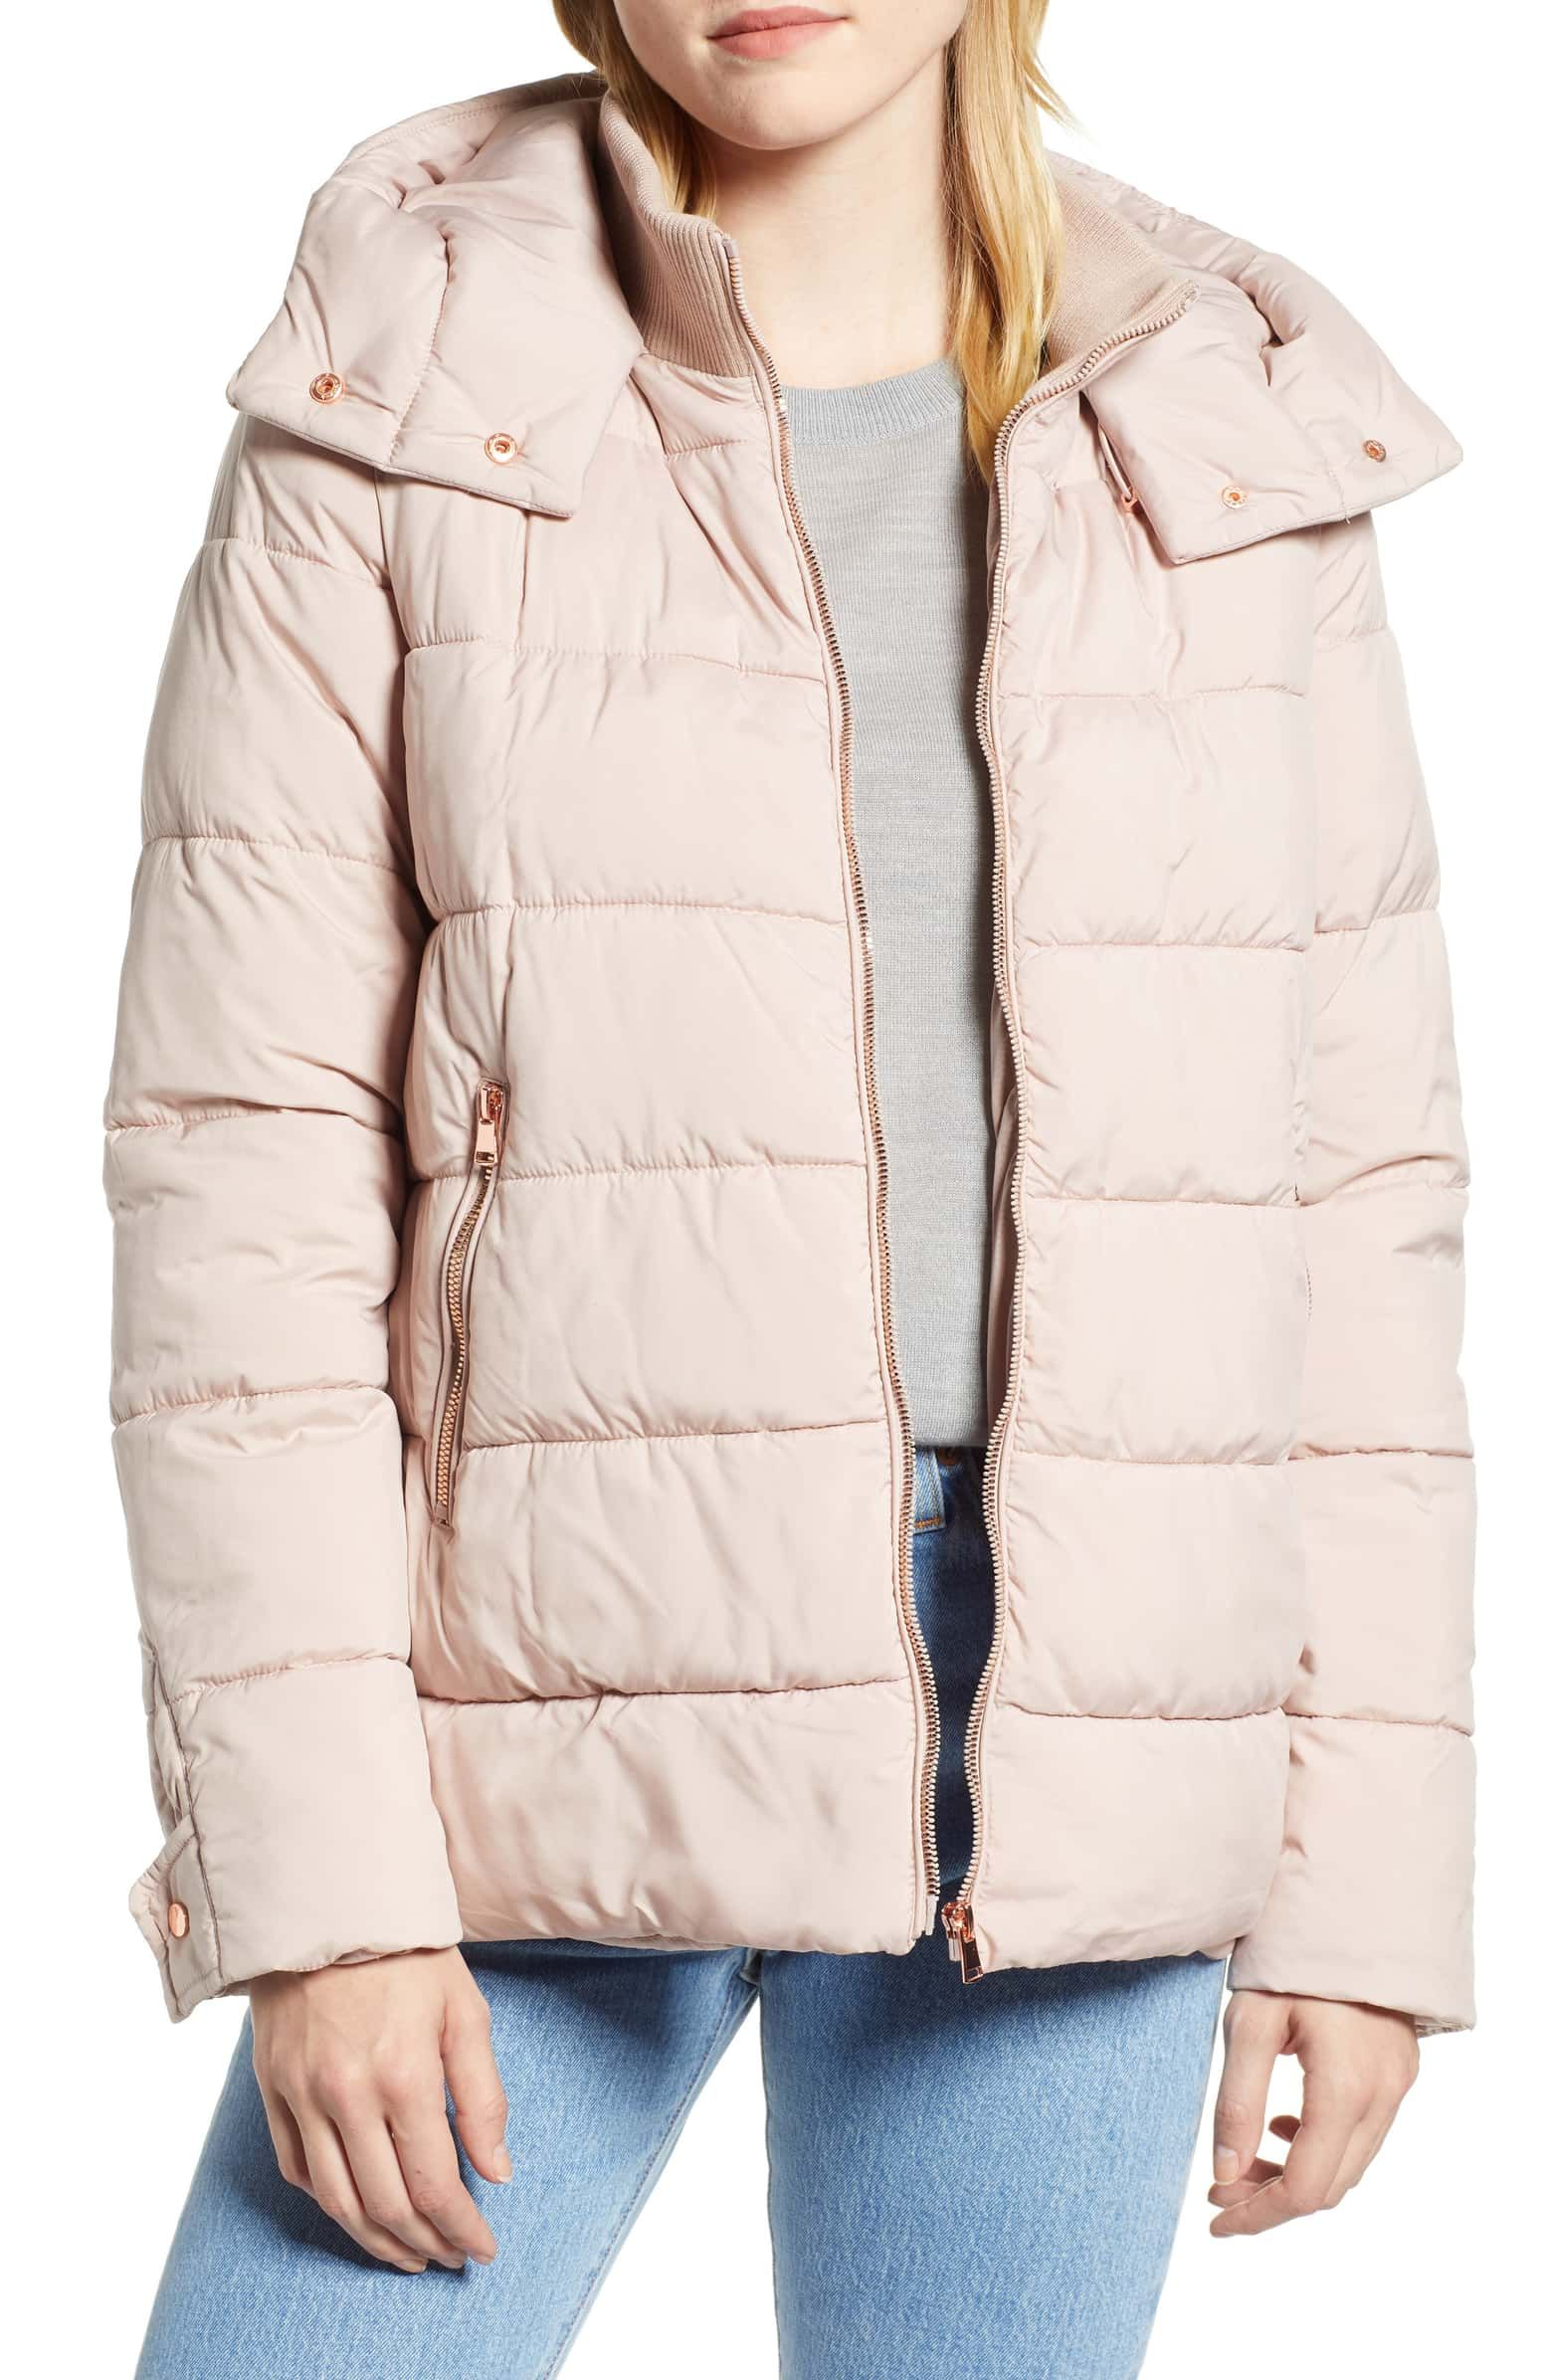 Halogen Hooded Puffer Jacket Nordstrom Puffer Jacket Women Puffer Jackets Coats Jackets Women [ 2392 x 1560 Pixel ]